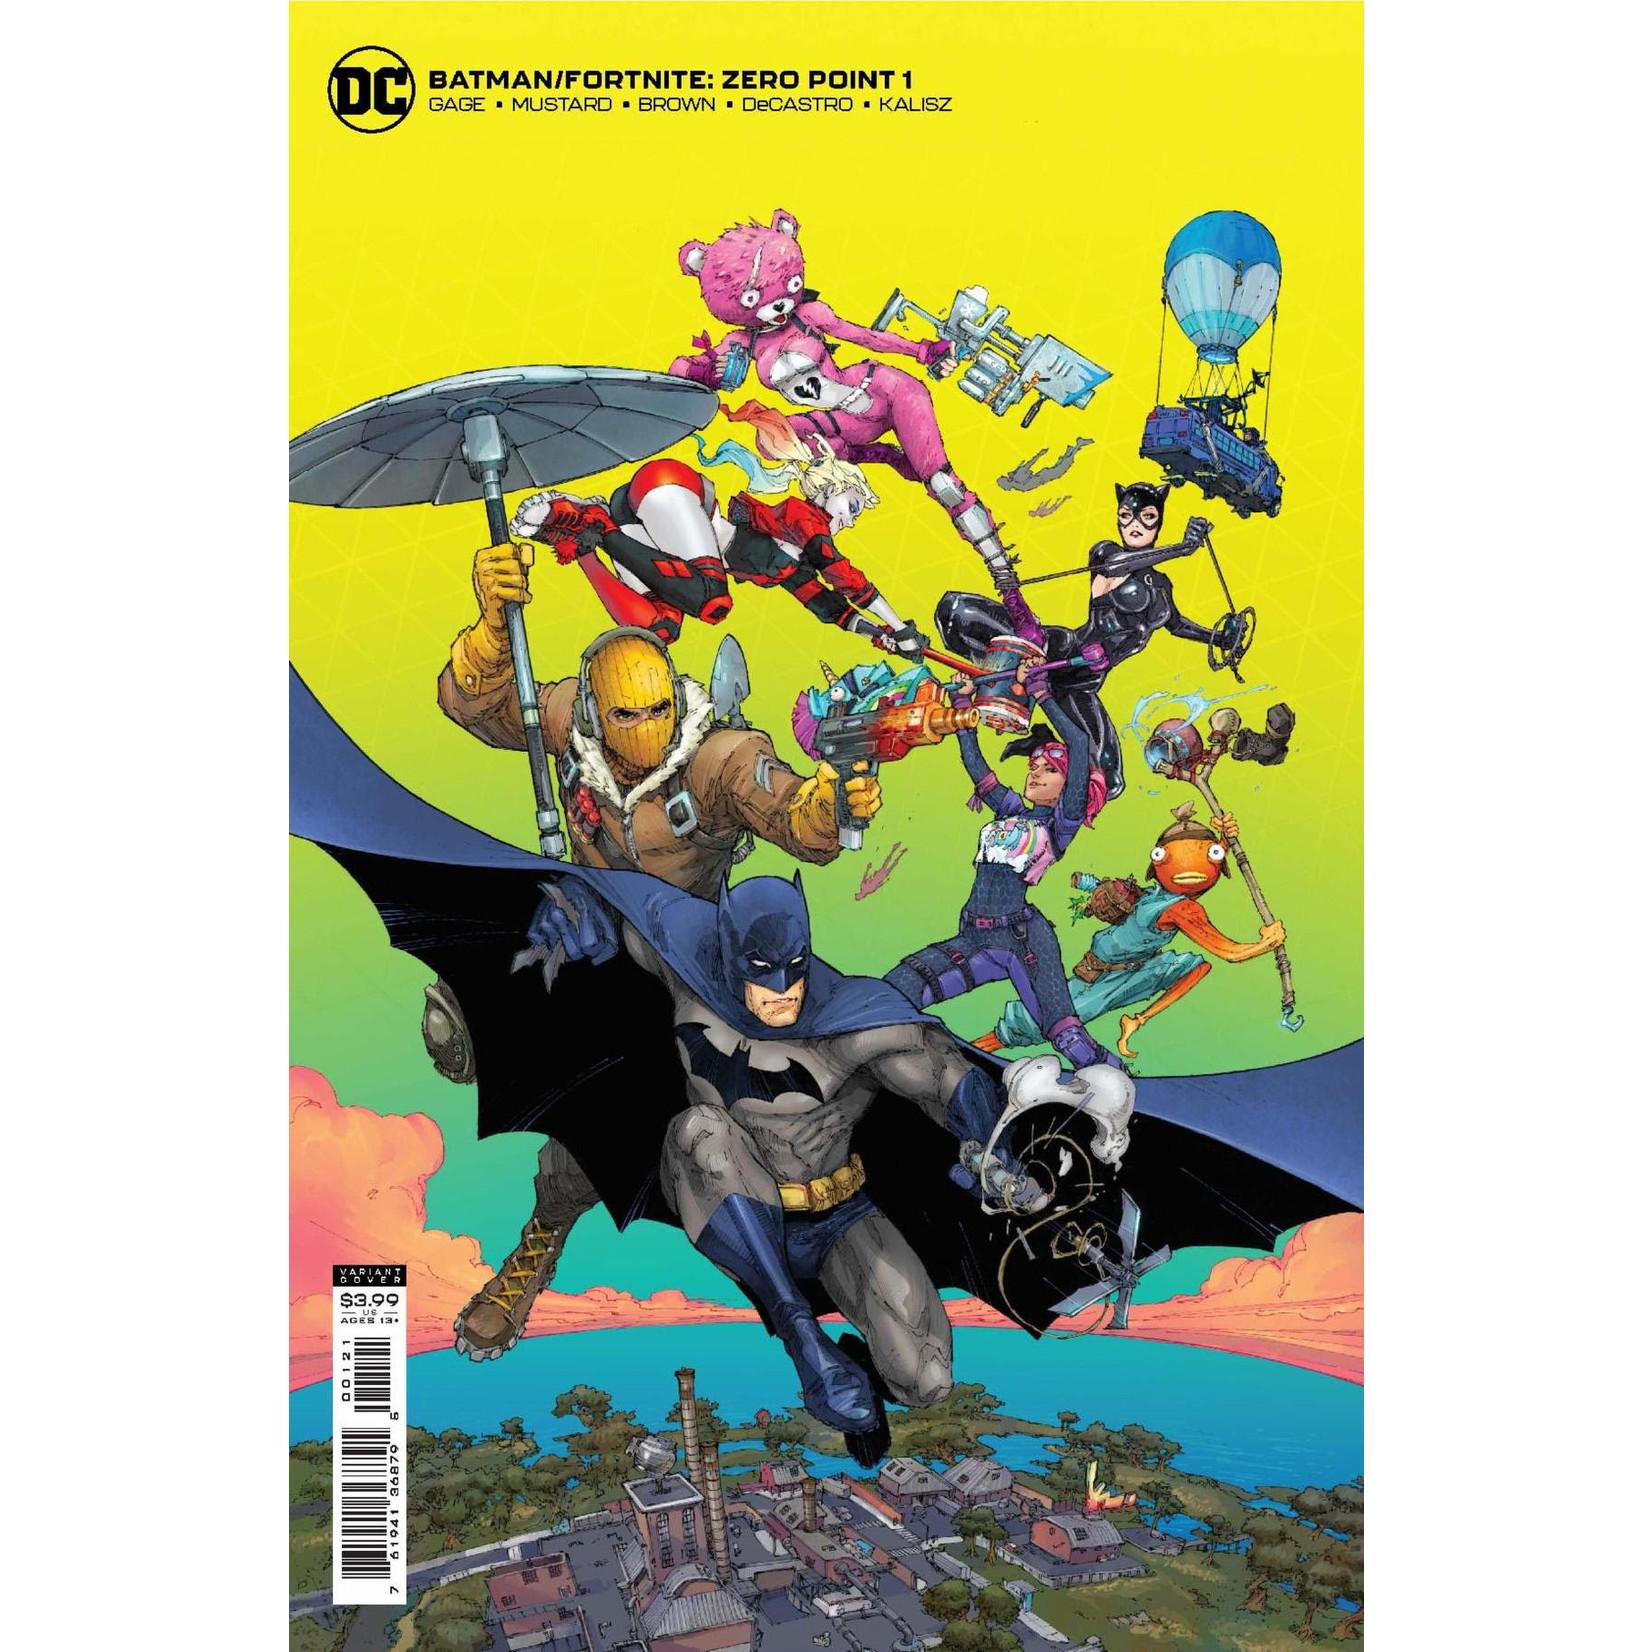 DC COMICS Batman Fortnite Zero Point #1 Cover B